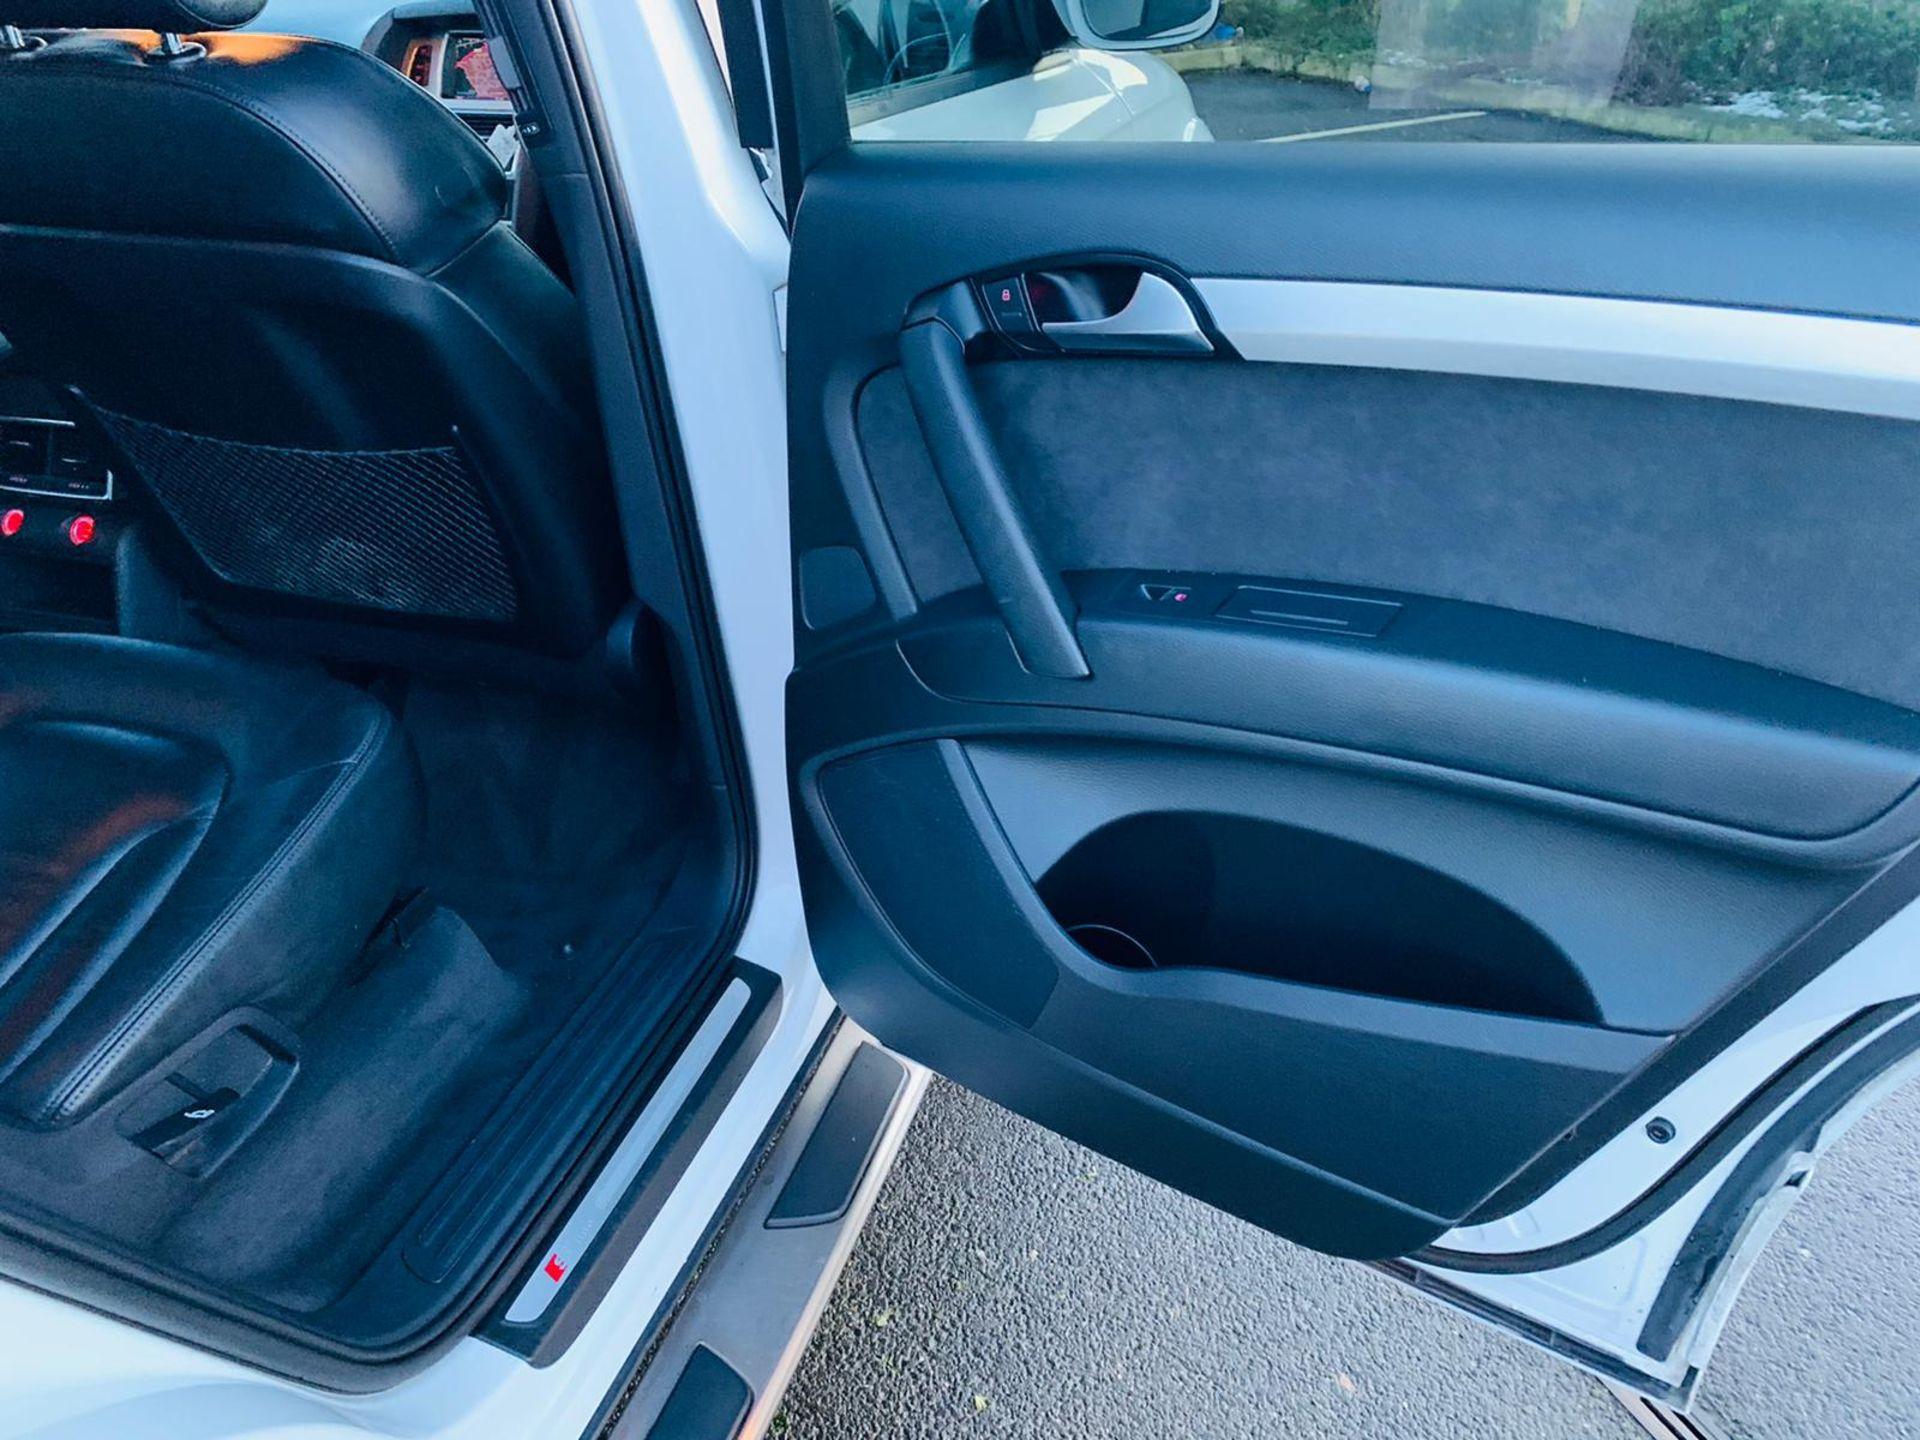 (Reserve Met)Audi Q7 3.0 TDI Quattro S Line Plus Auto (7 Seats) - 12 Reg - Only 63k Miles -Sat Nav- - Image 35 of 37